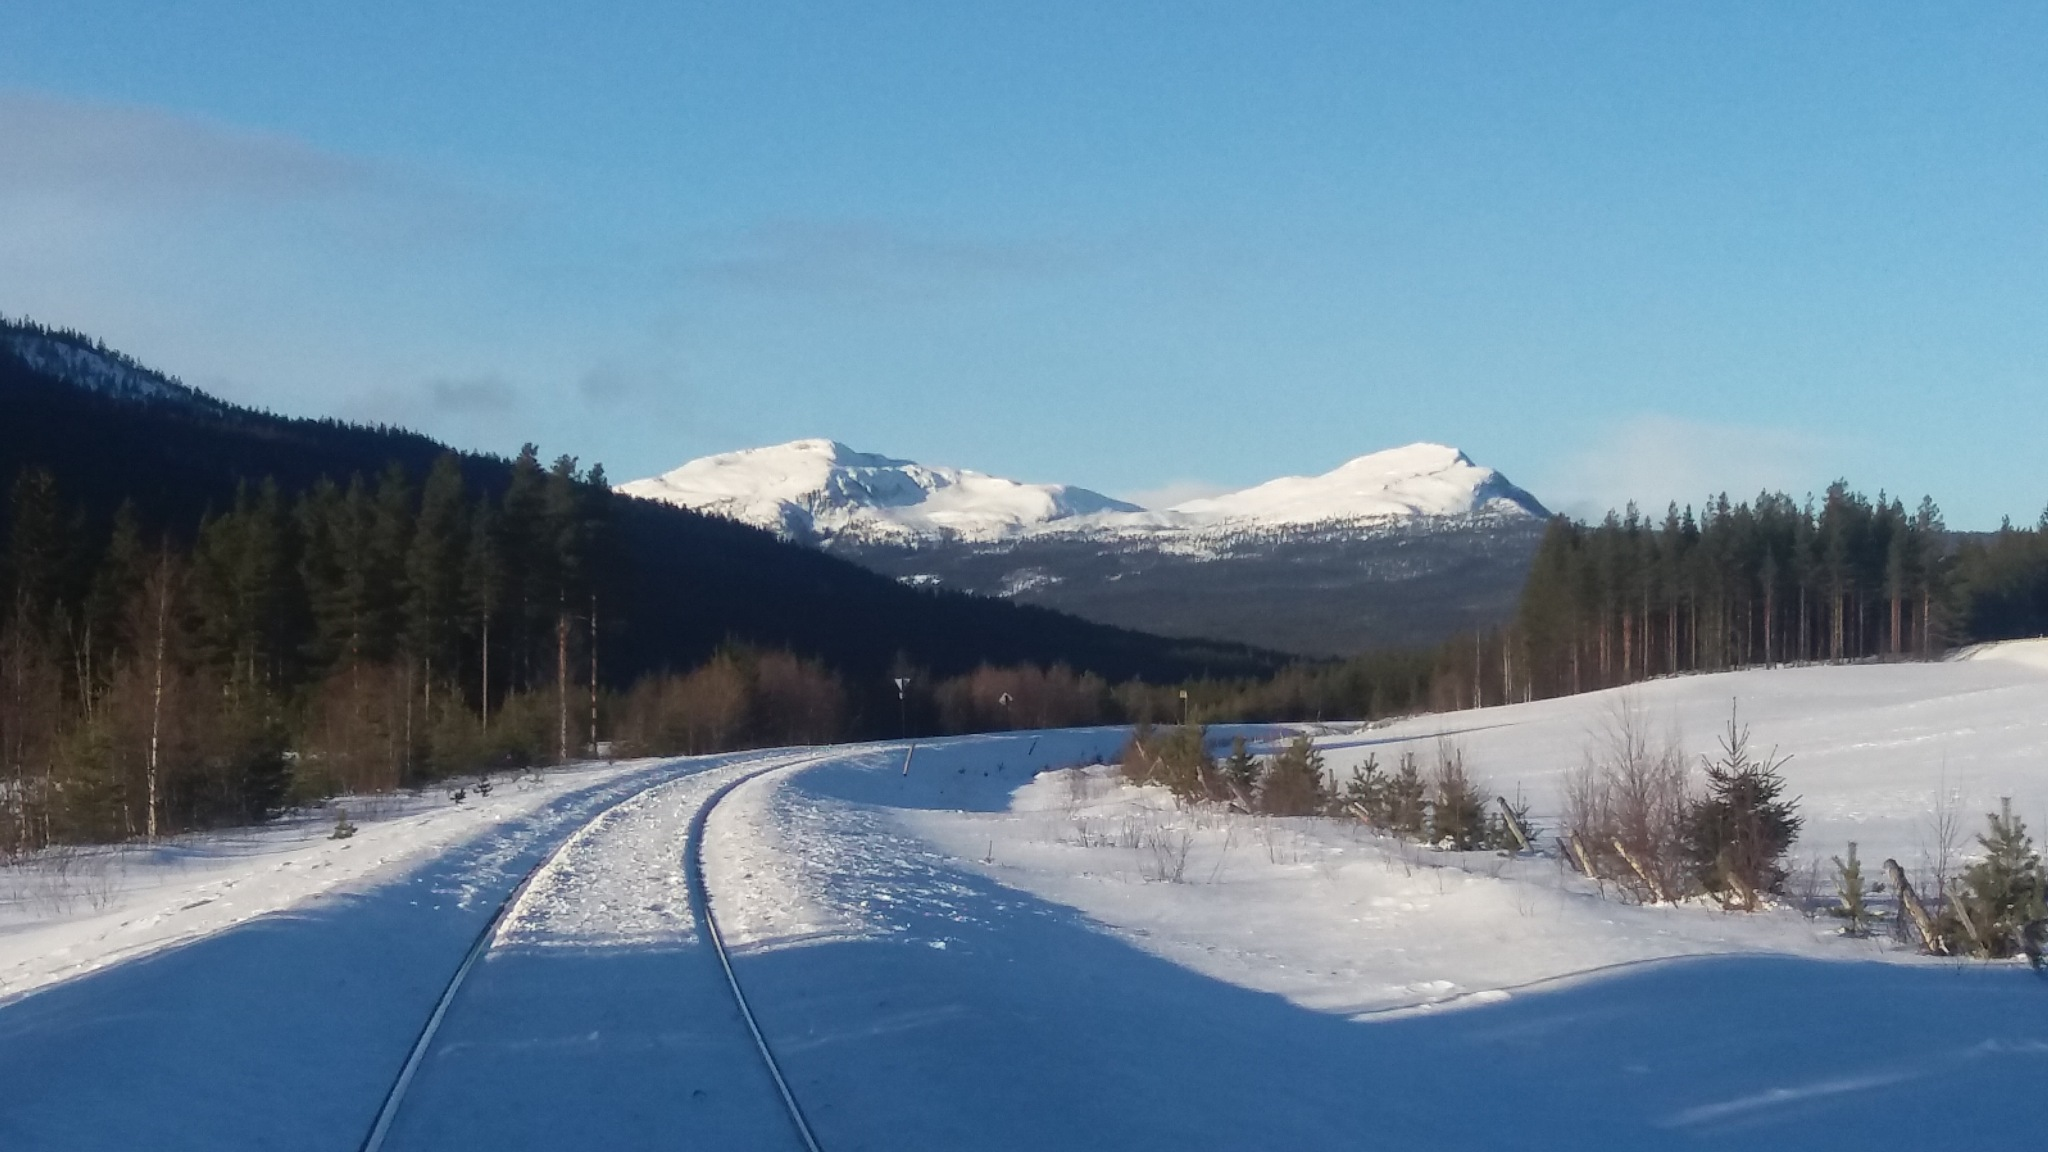 Winter landscape in Norway by Trude